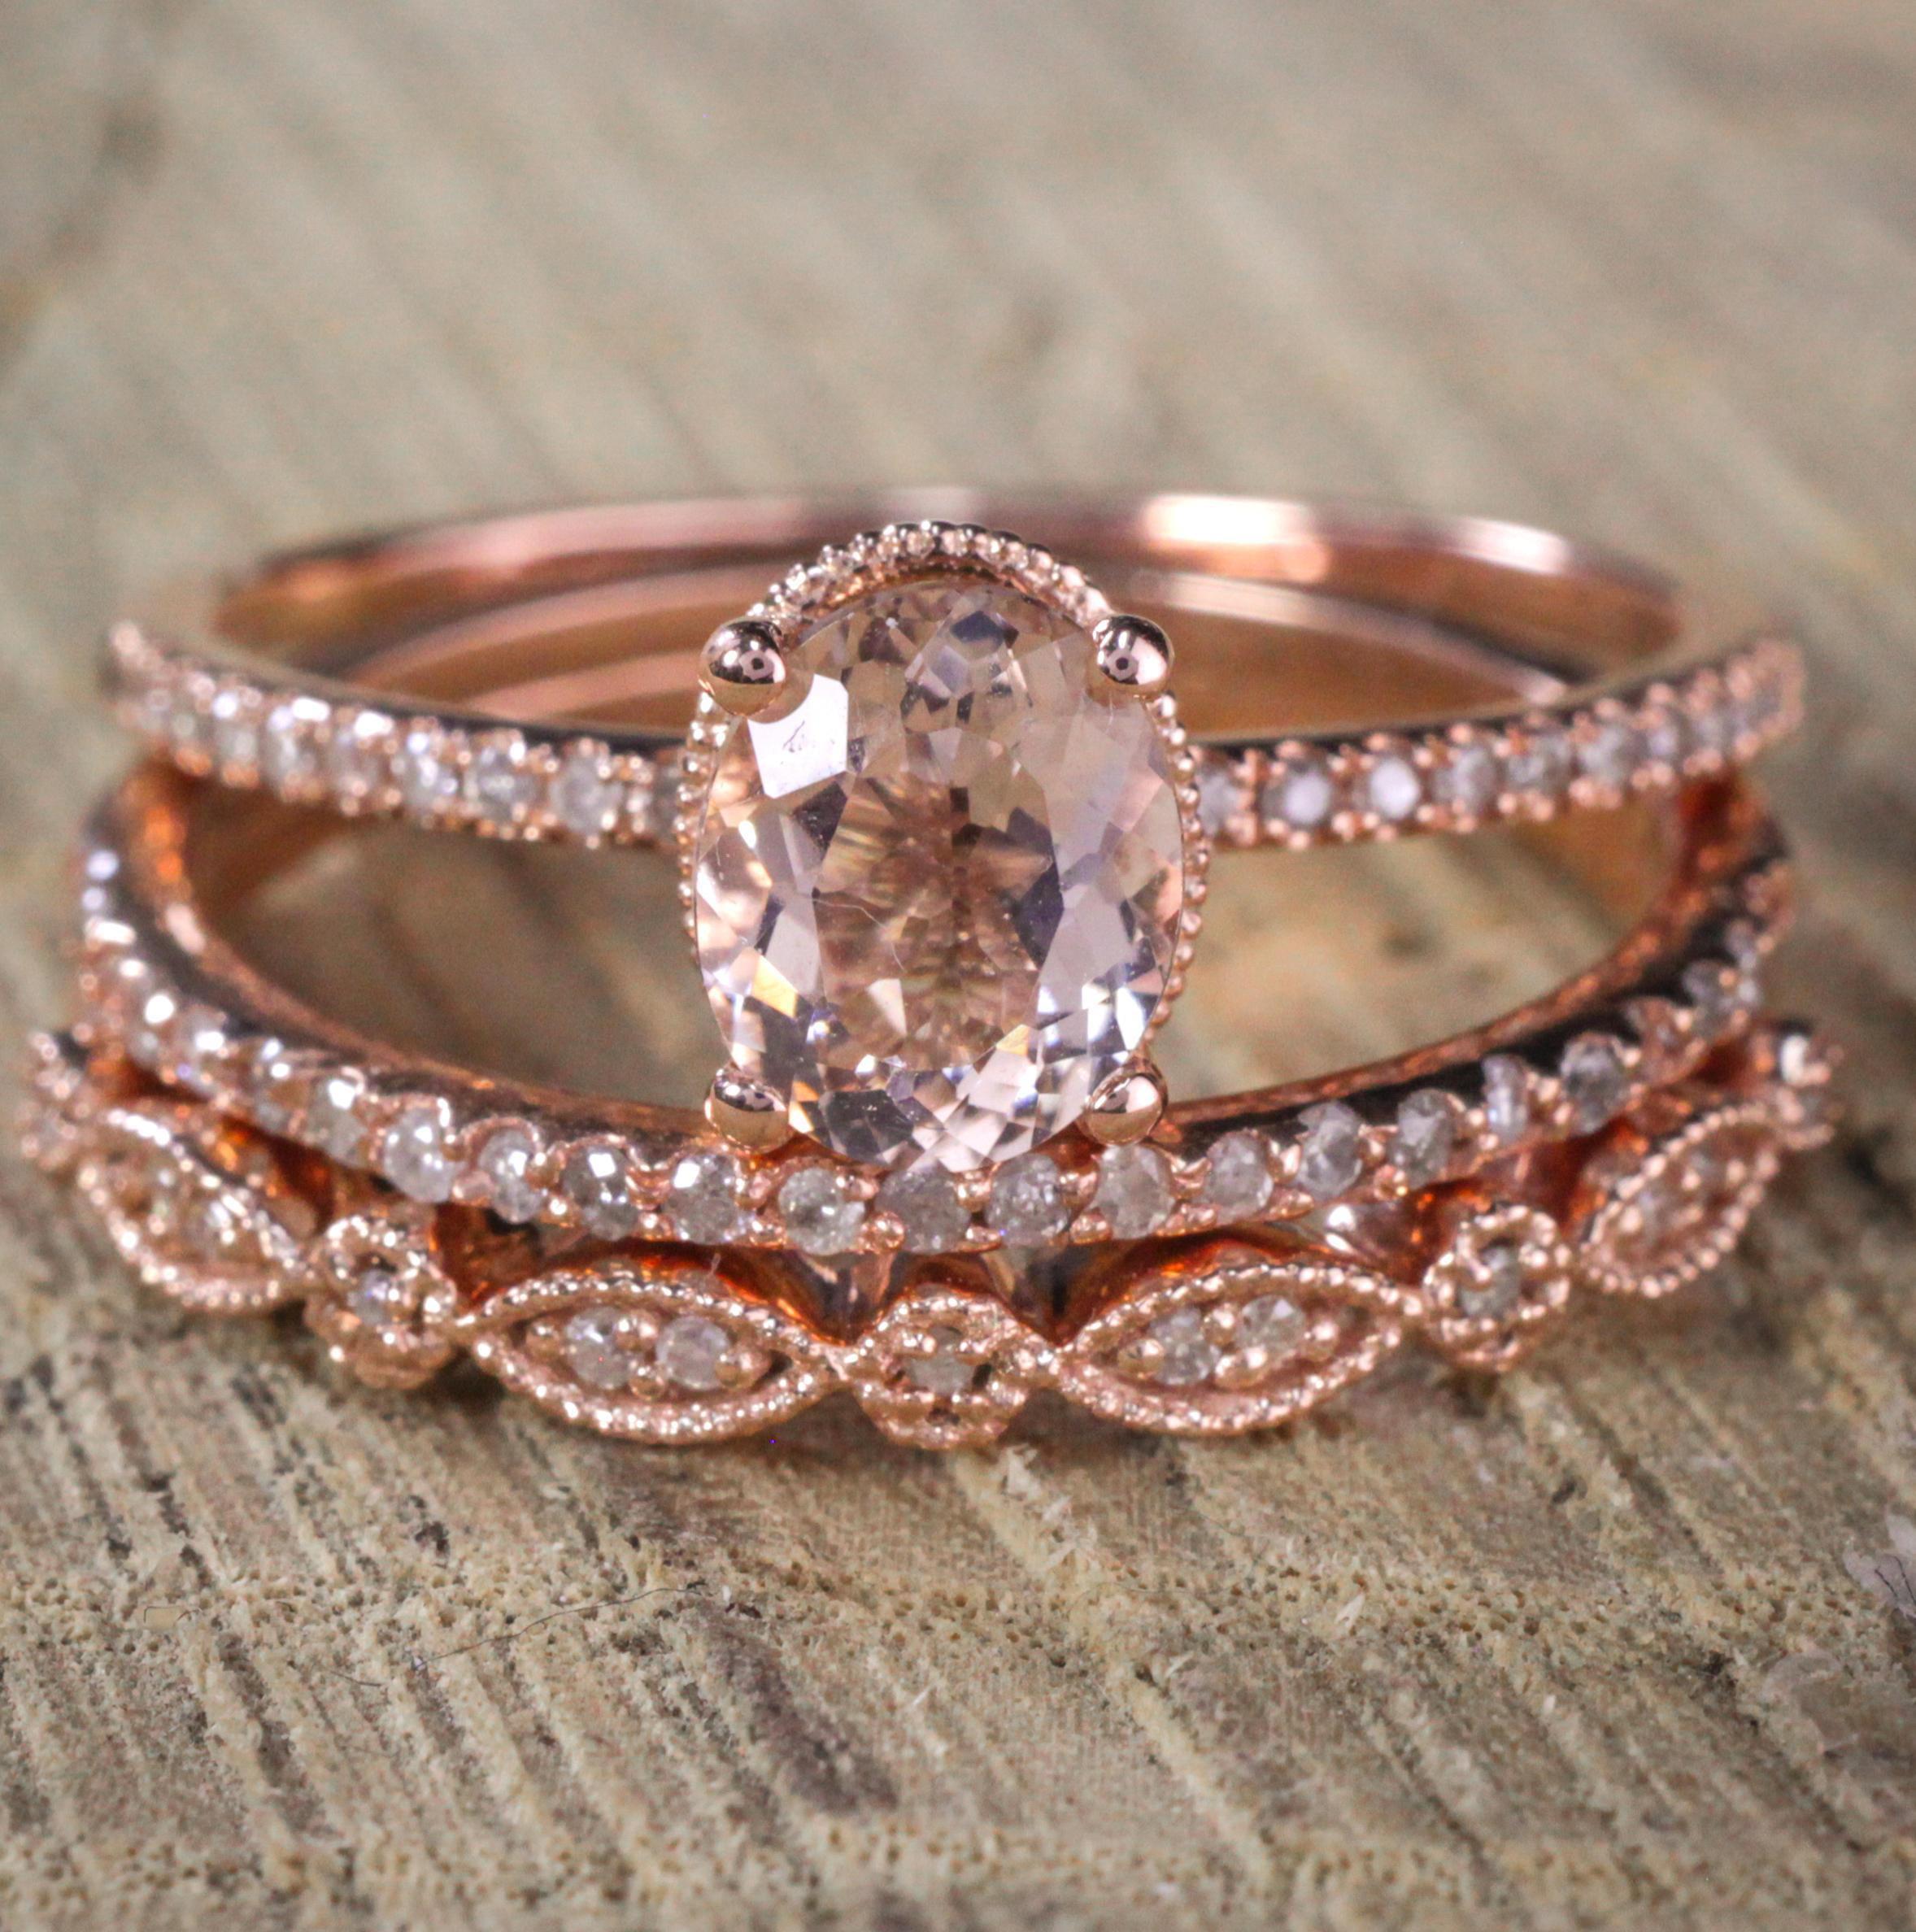 Diamond Rings For Sale Walmart: Sale 2 Carat Antique Milgrain Oval Shape